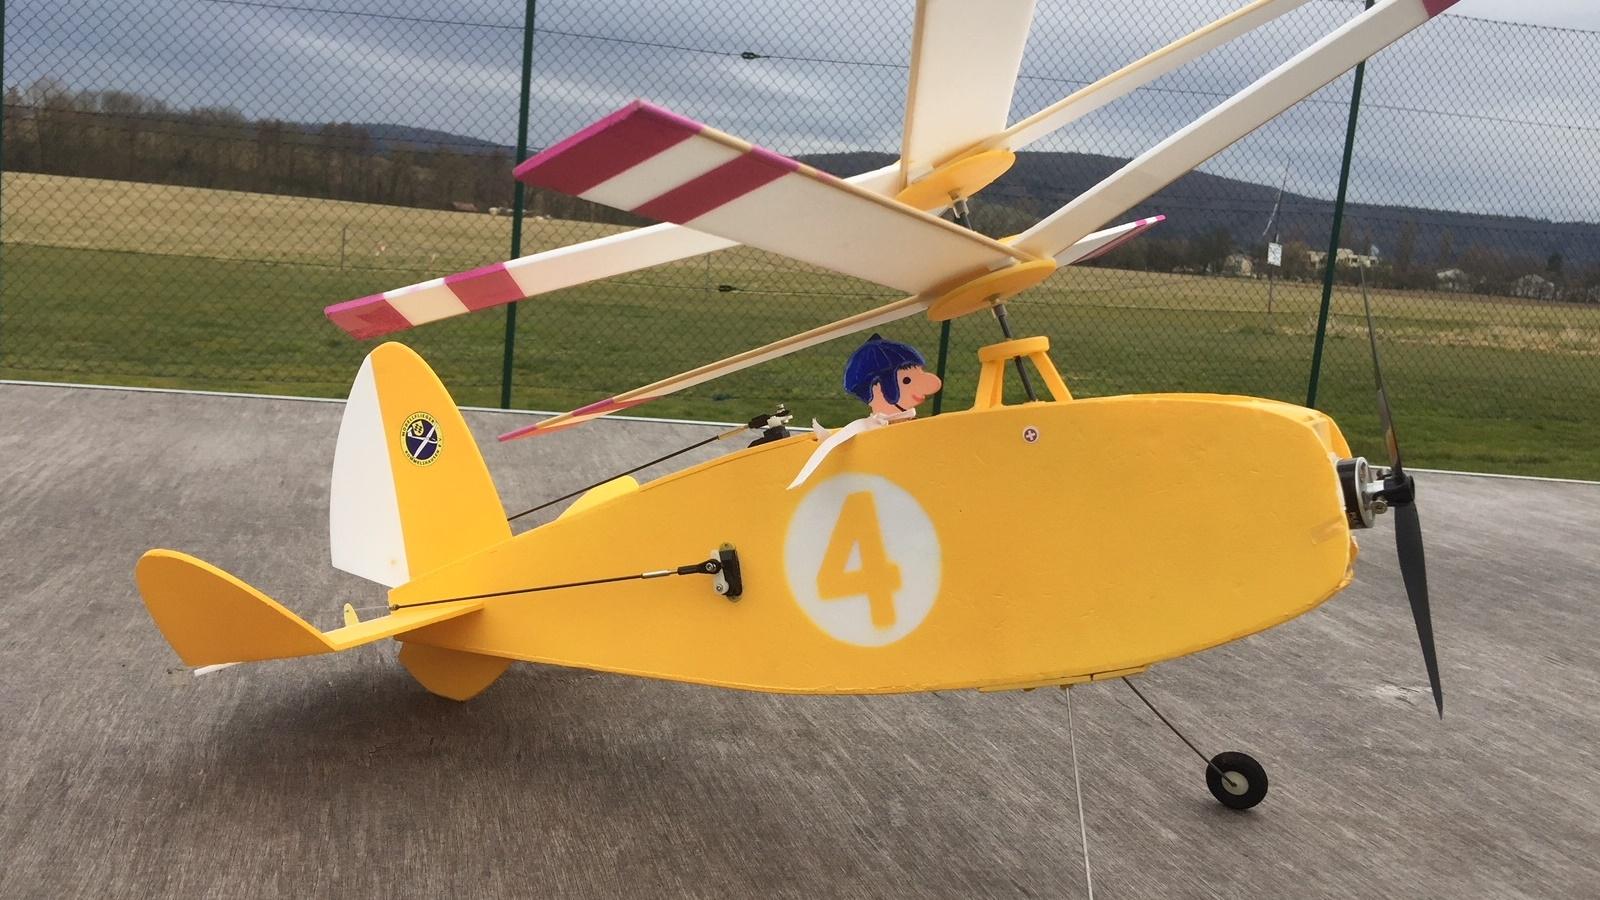 Jupiter Kwirl, Modell Aviator Downloadplan